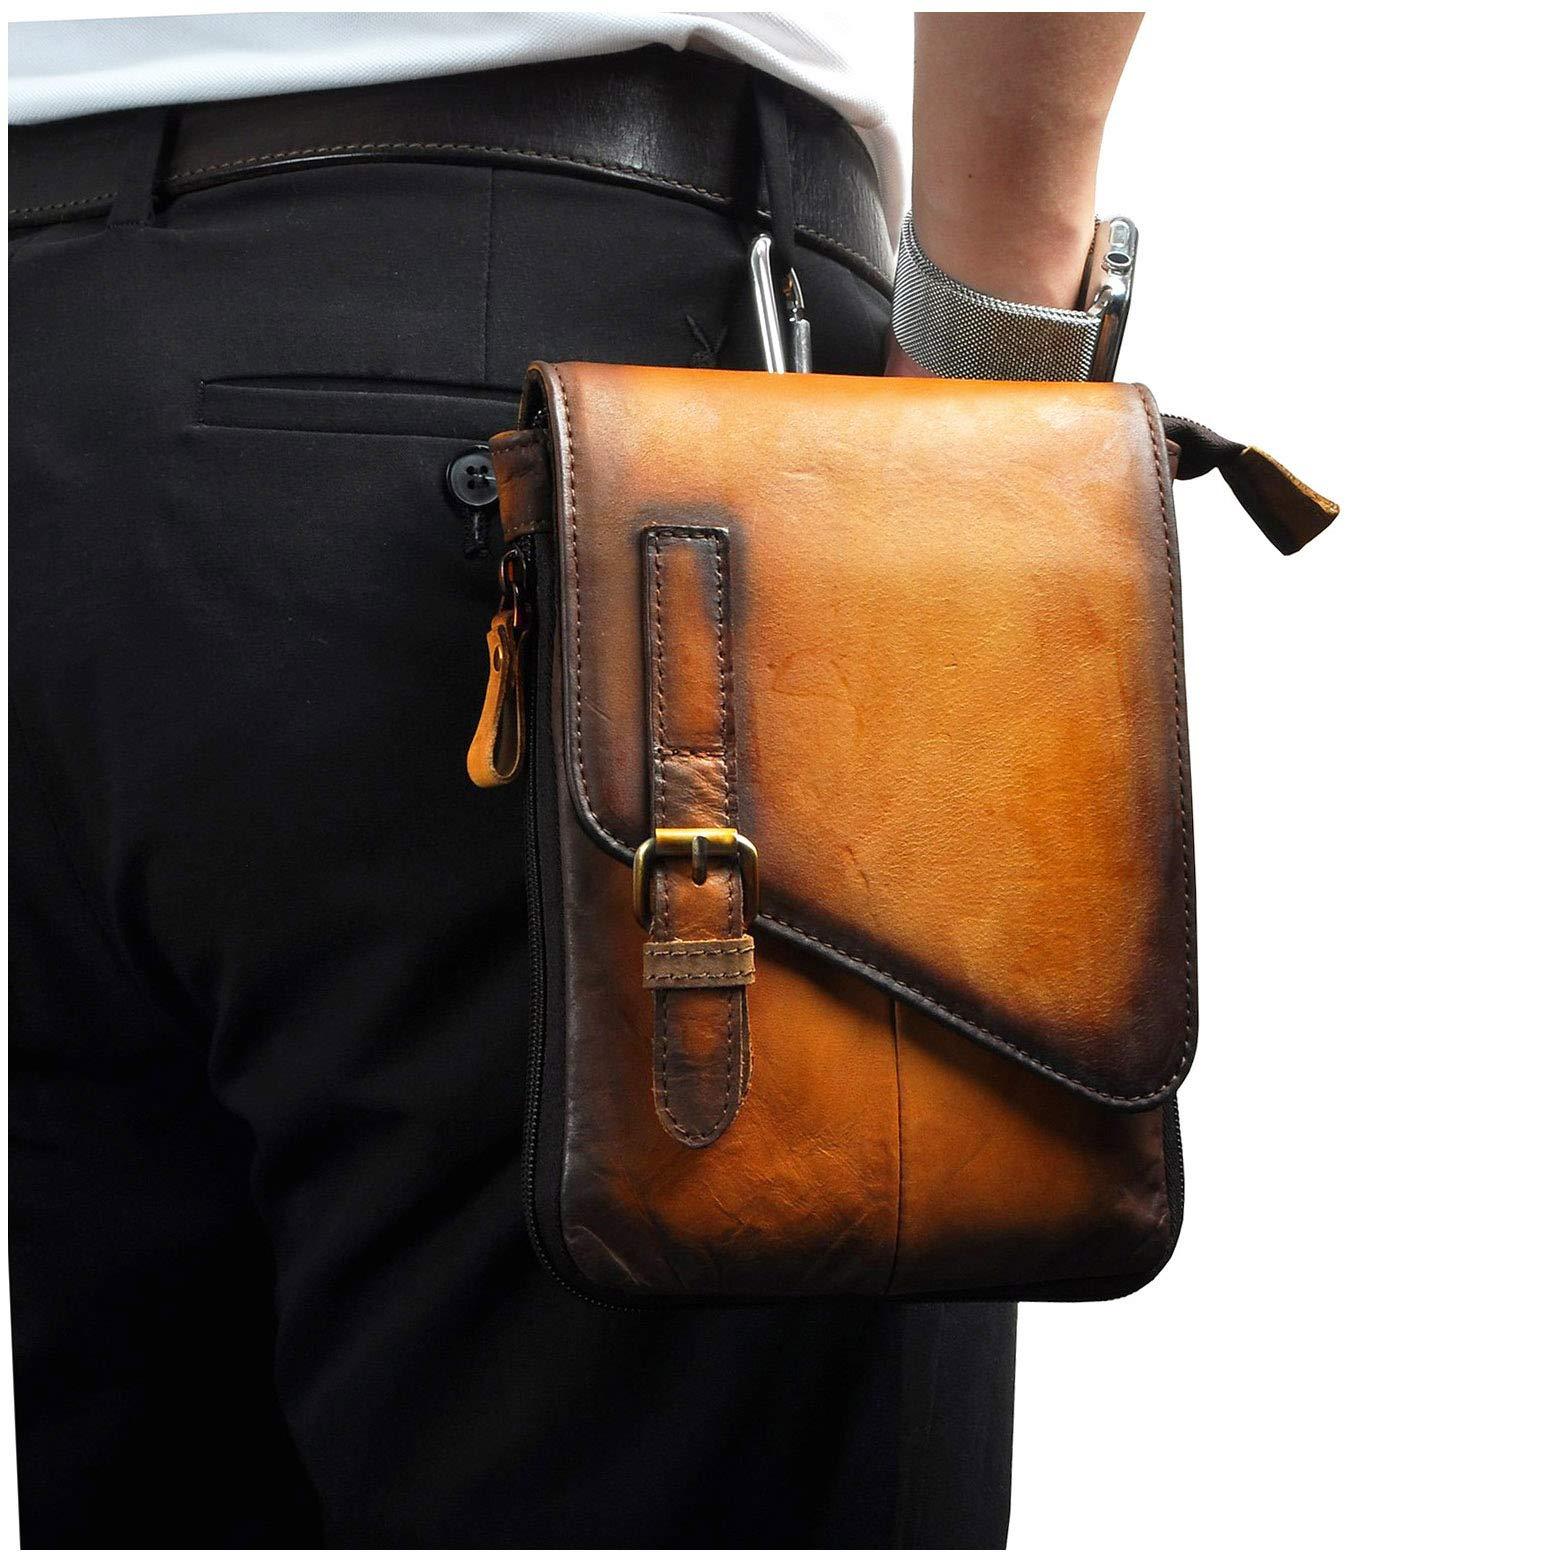 Le'aokuu Mens Genuine Leather Coffee Fanny Small Messenger Shoulder Satchel Waist Bag Pack (Large Size-light brown)